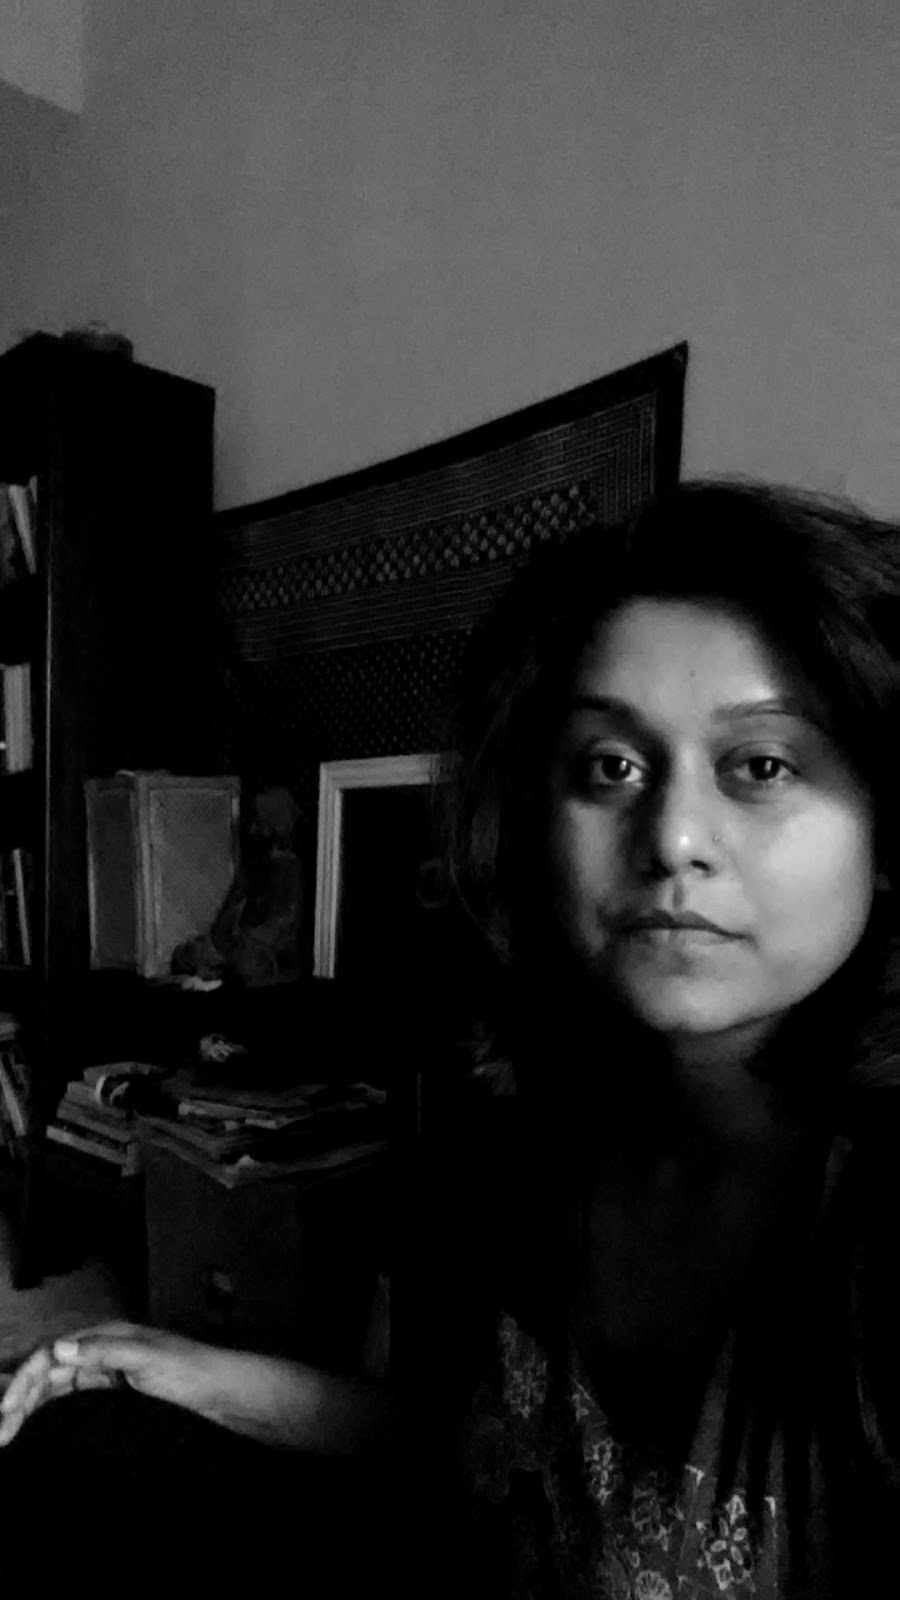 Artist Interview: Meet Priya Vadhyar